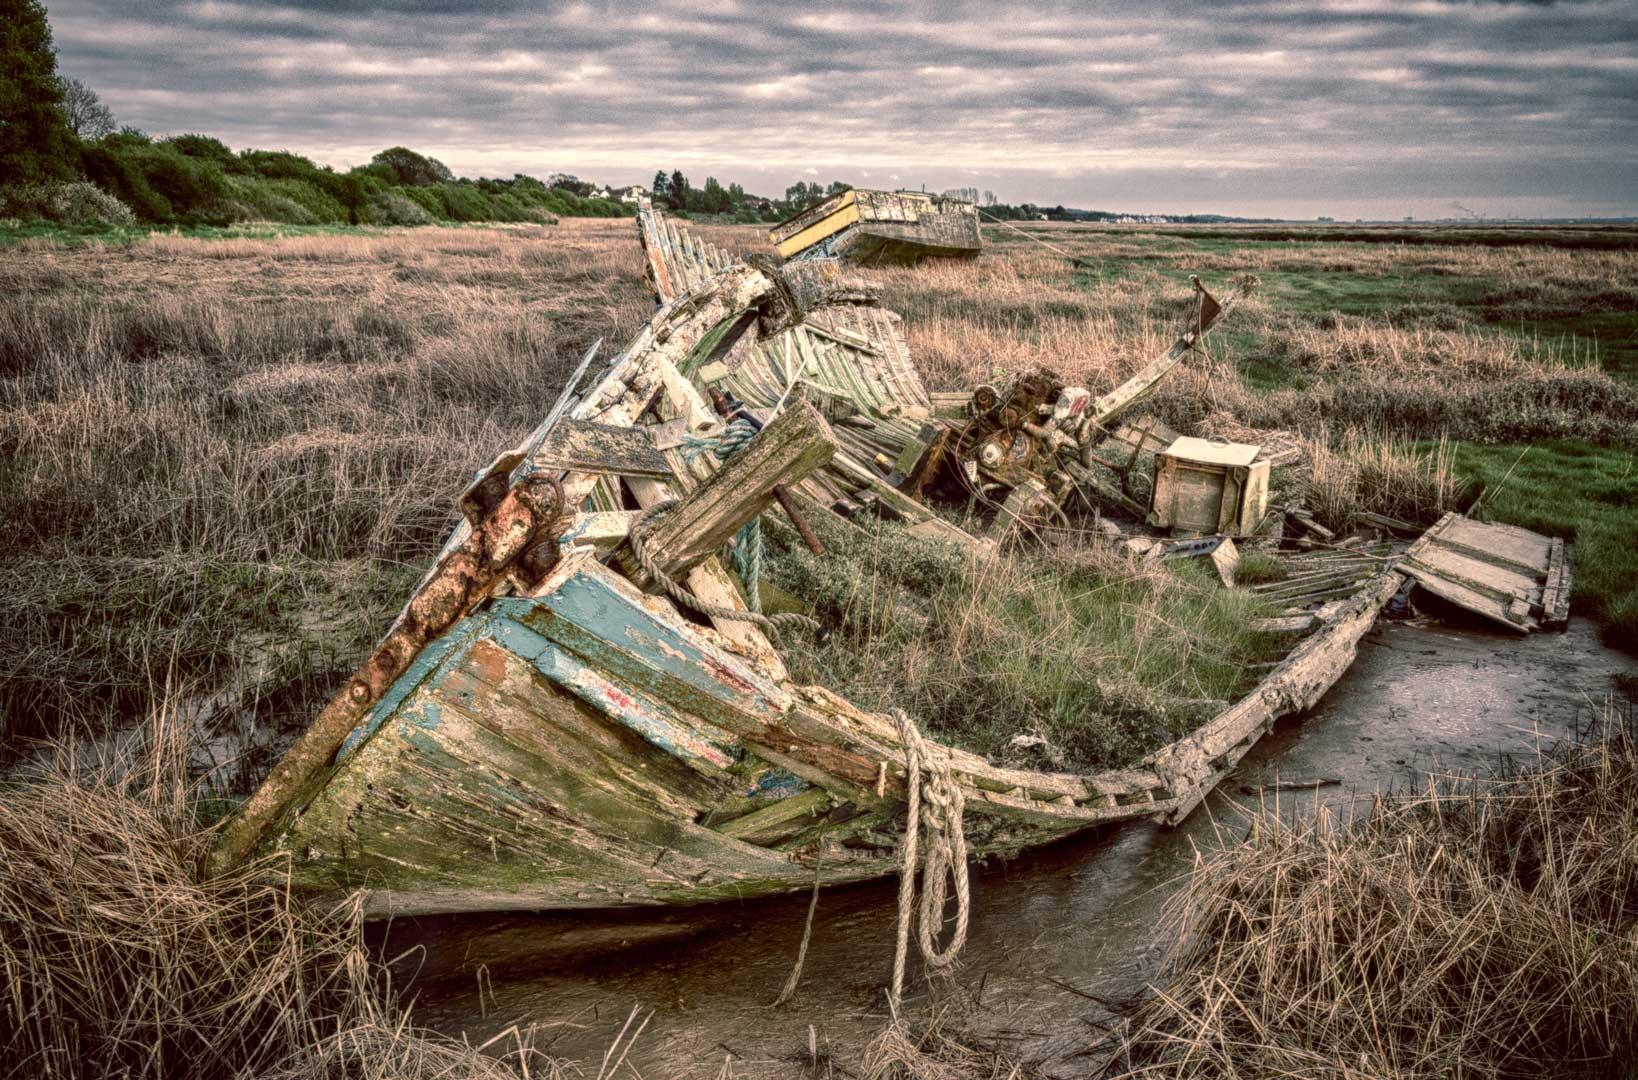 Secret Boat Graveyard, United Kingdom